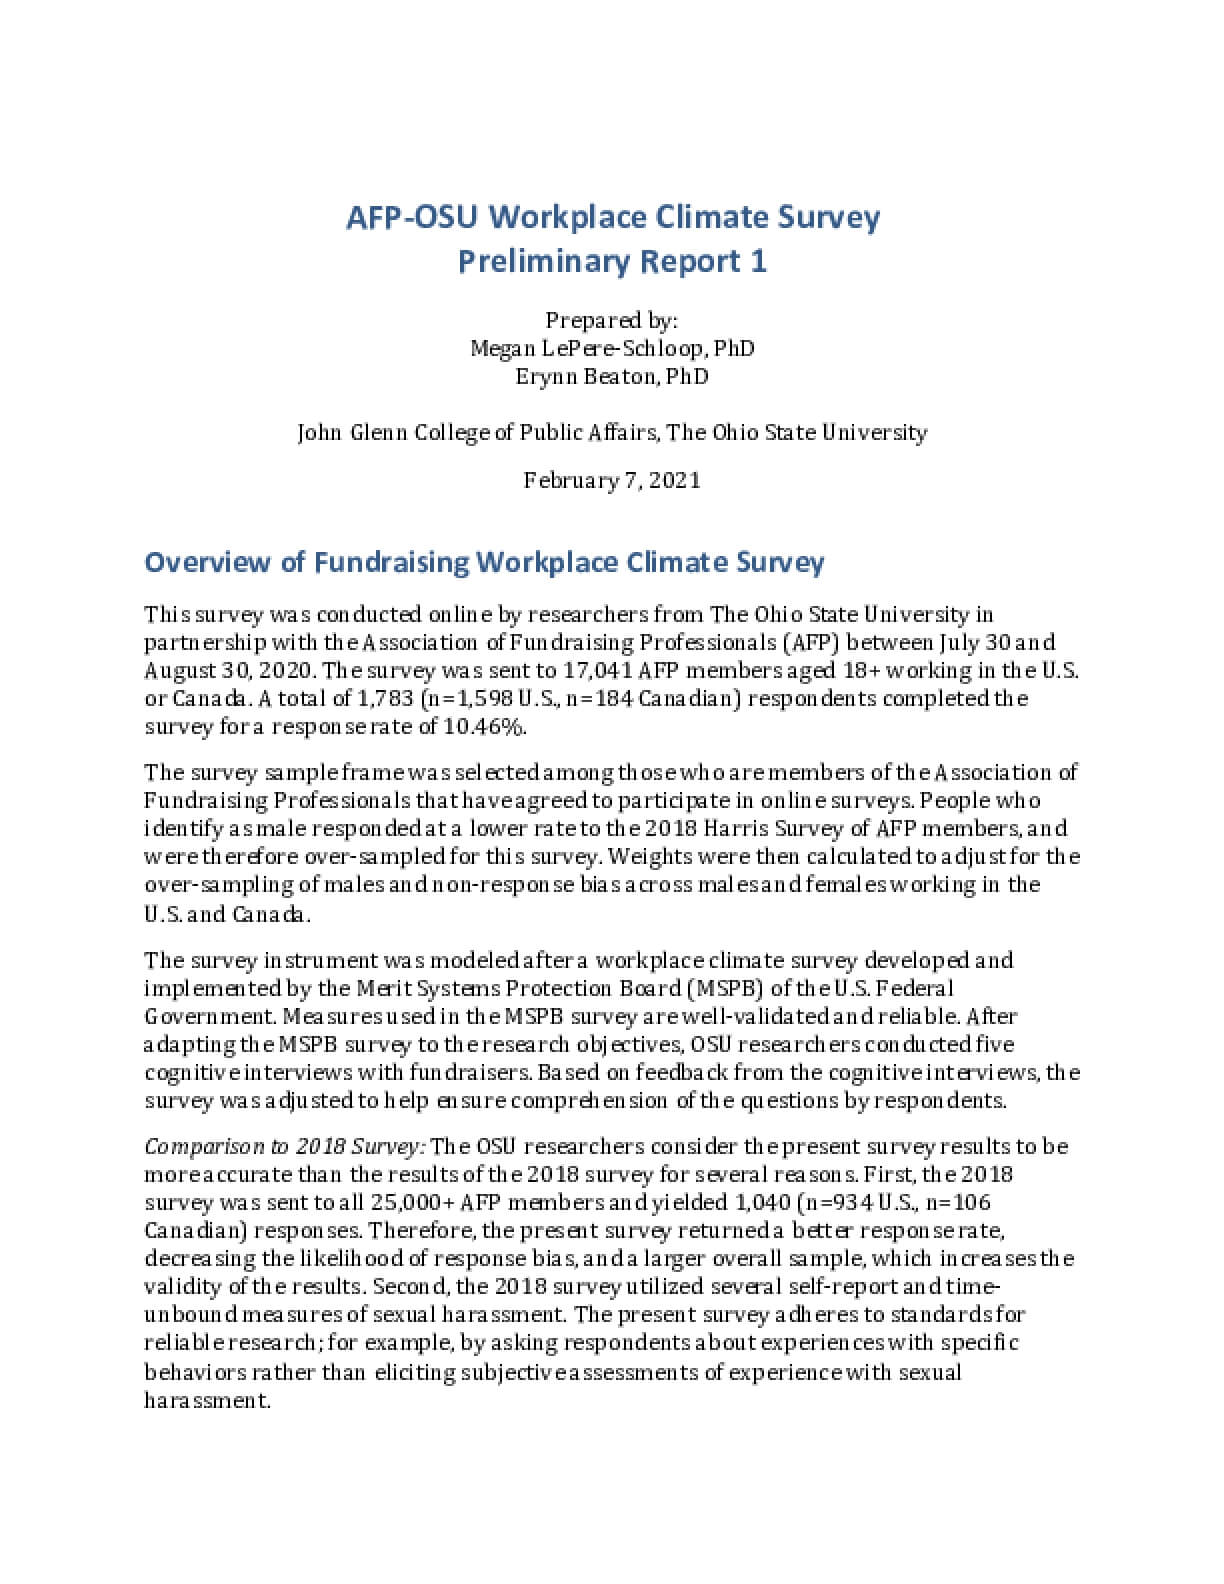 AFP-OSU Workplace Climate Survey Preliminary Report 1